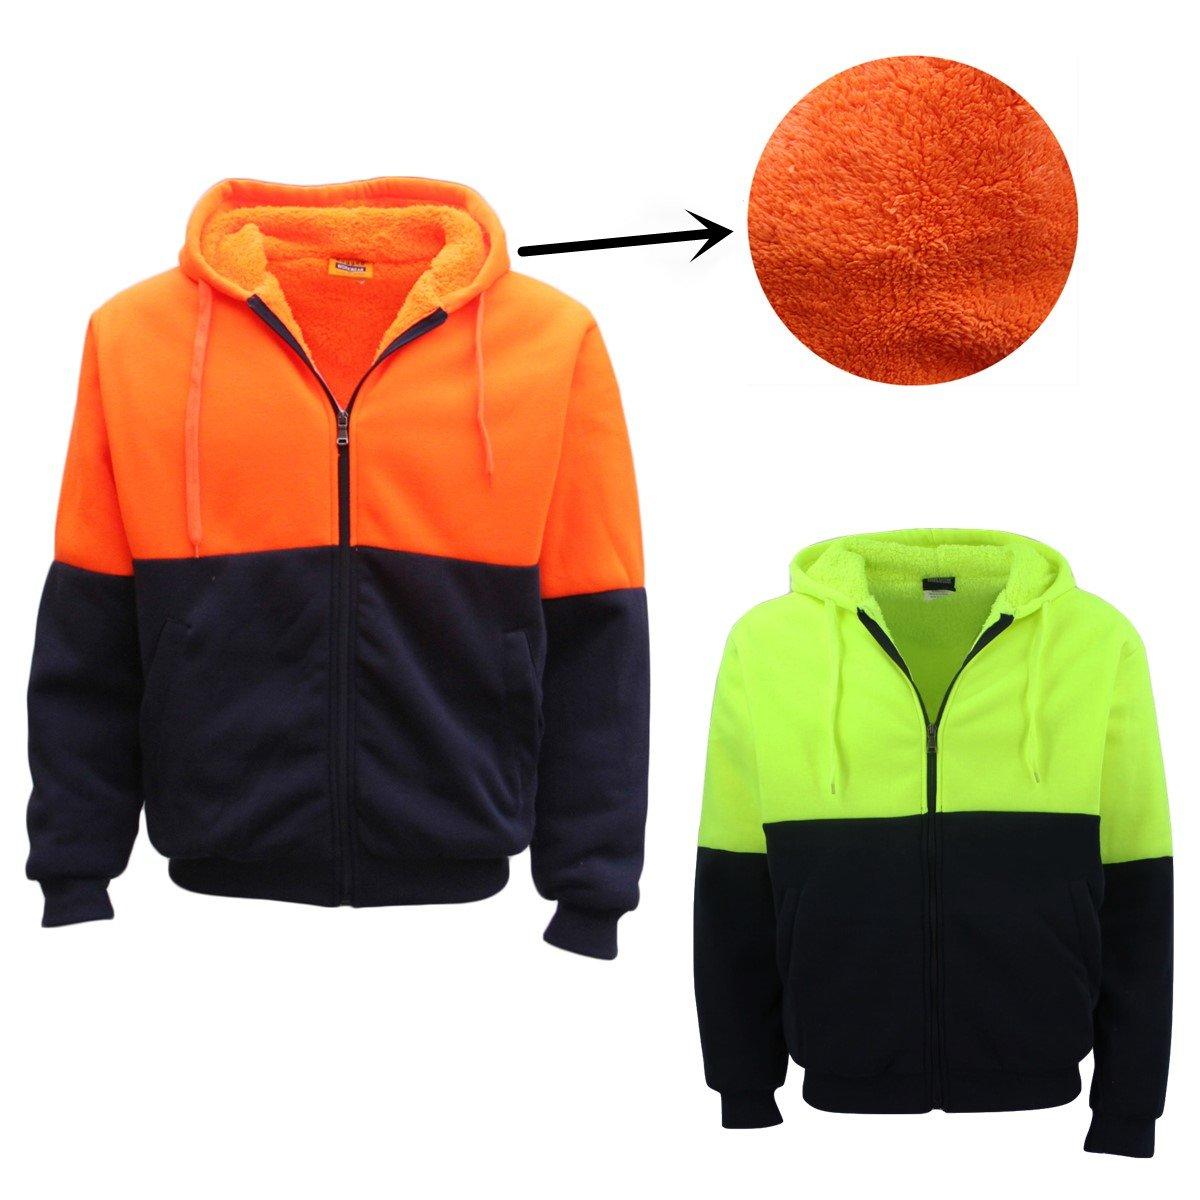 bc8536501 HI VIS Safety Full Zip Thick Sherpa Fleece Hoodie Workwear Jacket Jumper  Winter